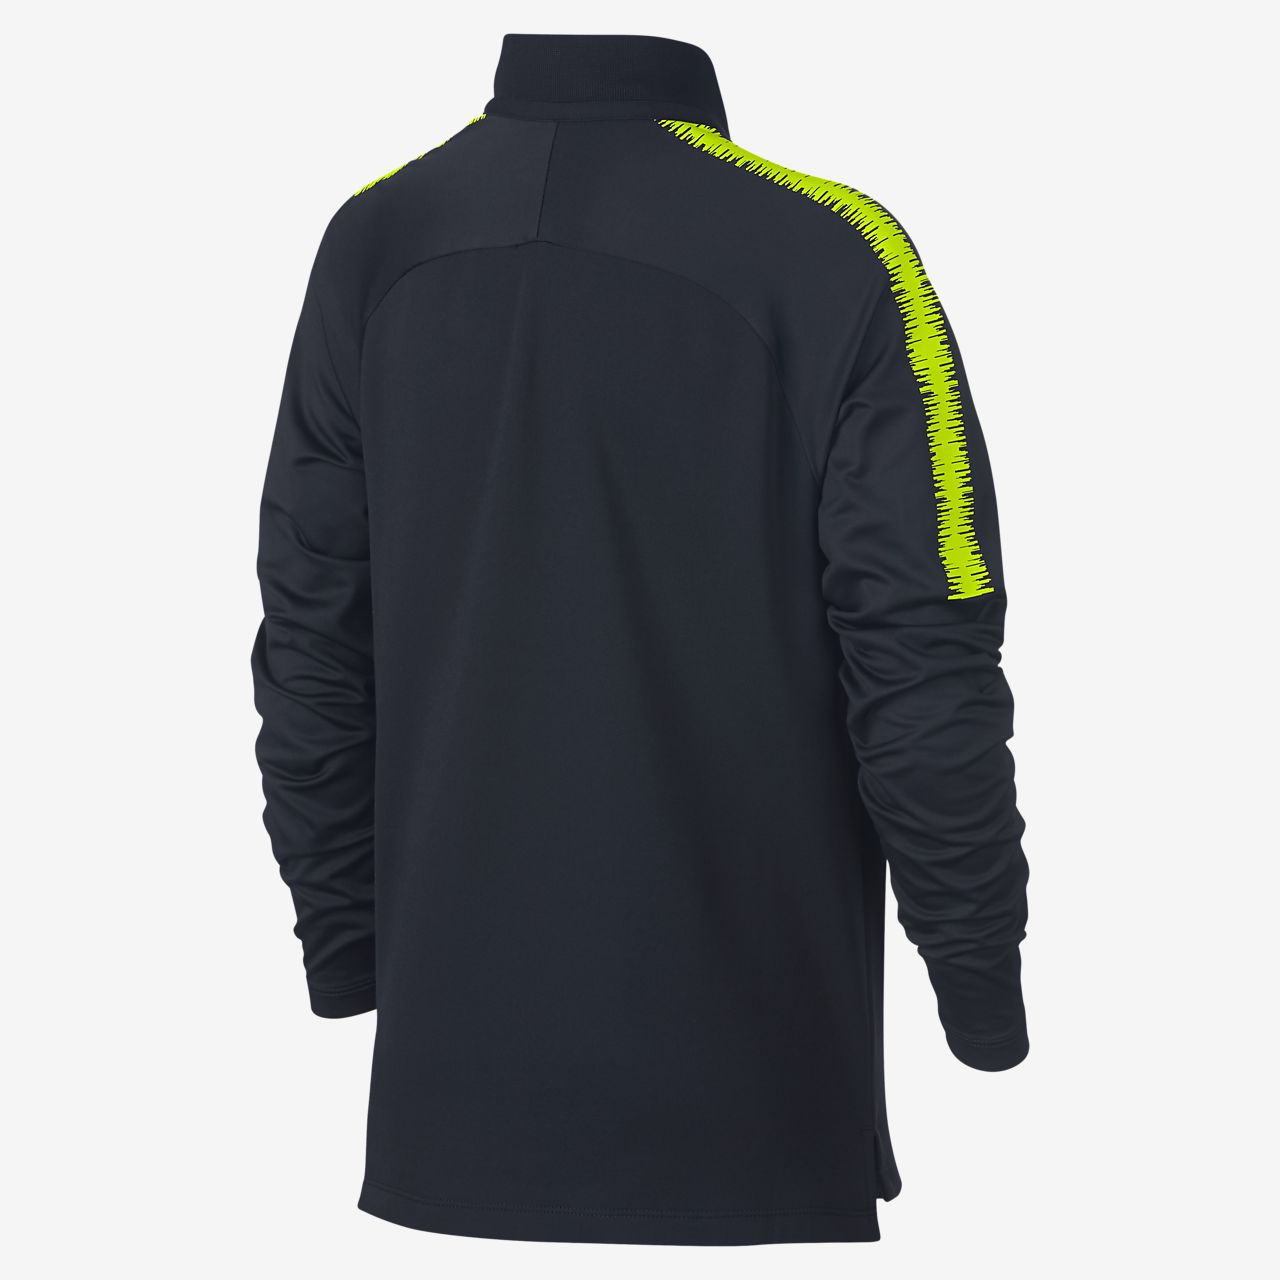 531f8e9b ... Manchester City FC Dri-FIT Squad Drill Older Kids' Long-Sleeve Football  Top